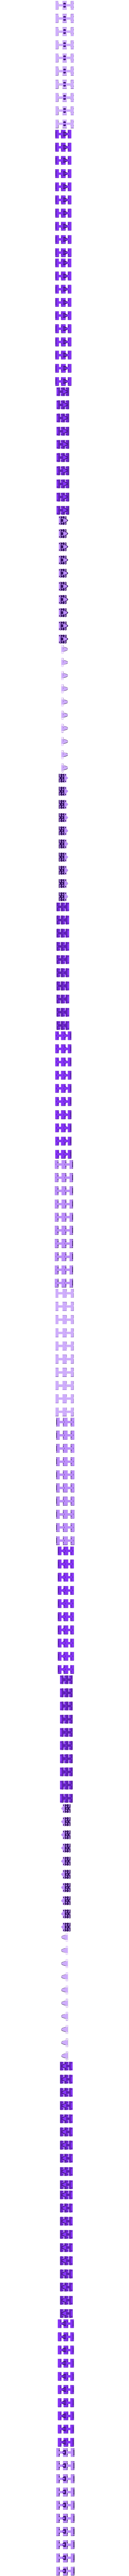 mini_T-34_track2_x10.stl Download STL file Mini T-34 • 3D printer model, c47